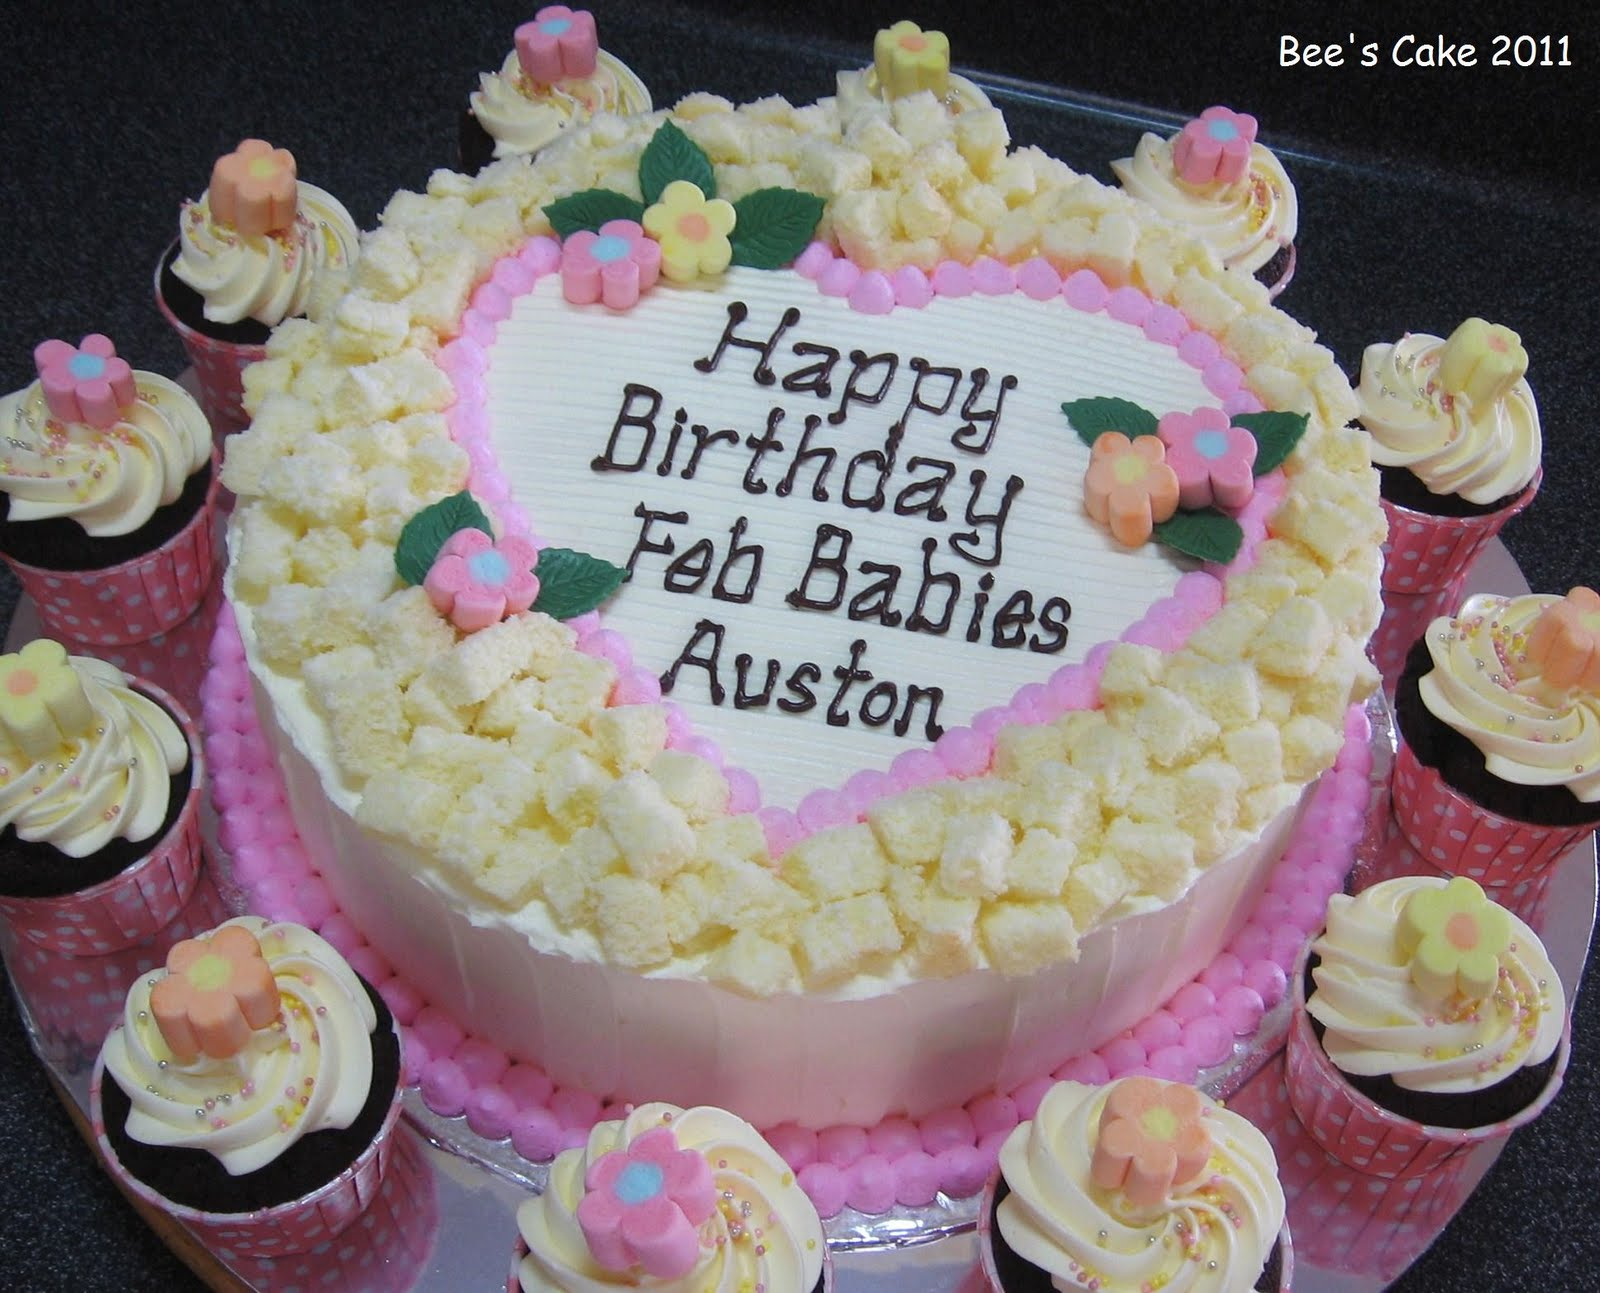 February Birthday Cakes Bees Cake Happy Birthday Feb Babies